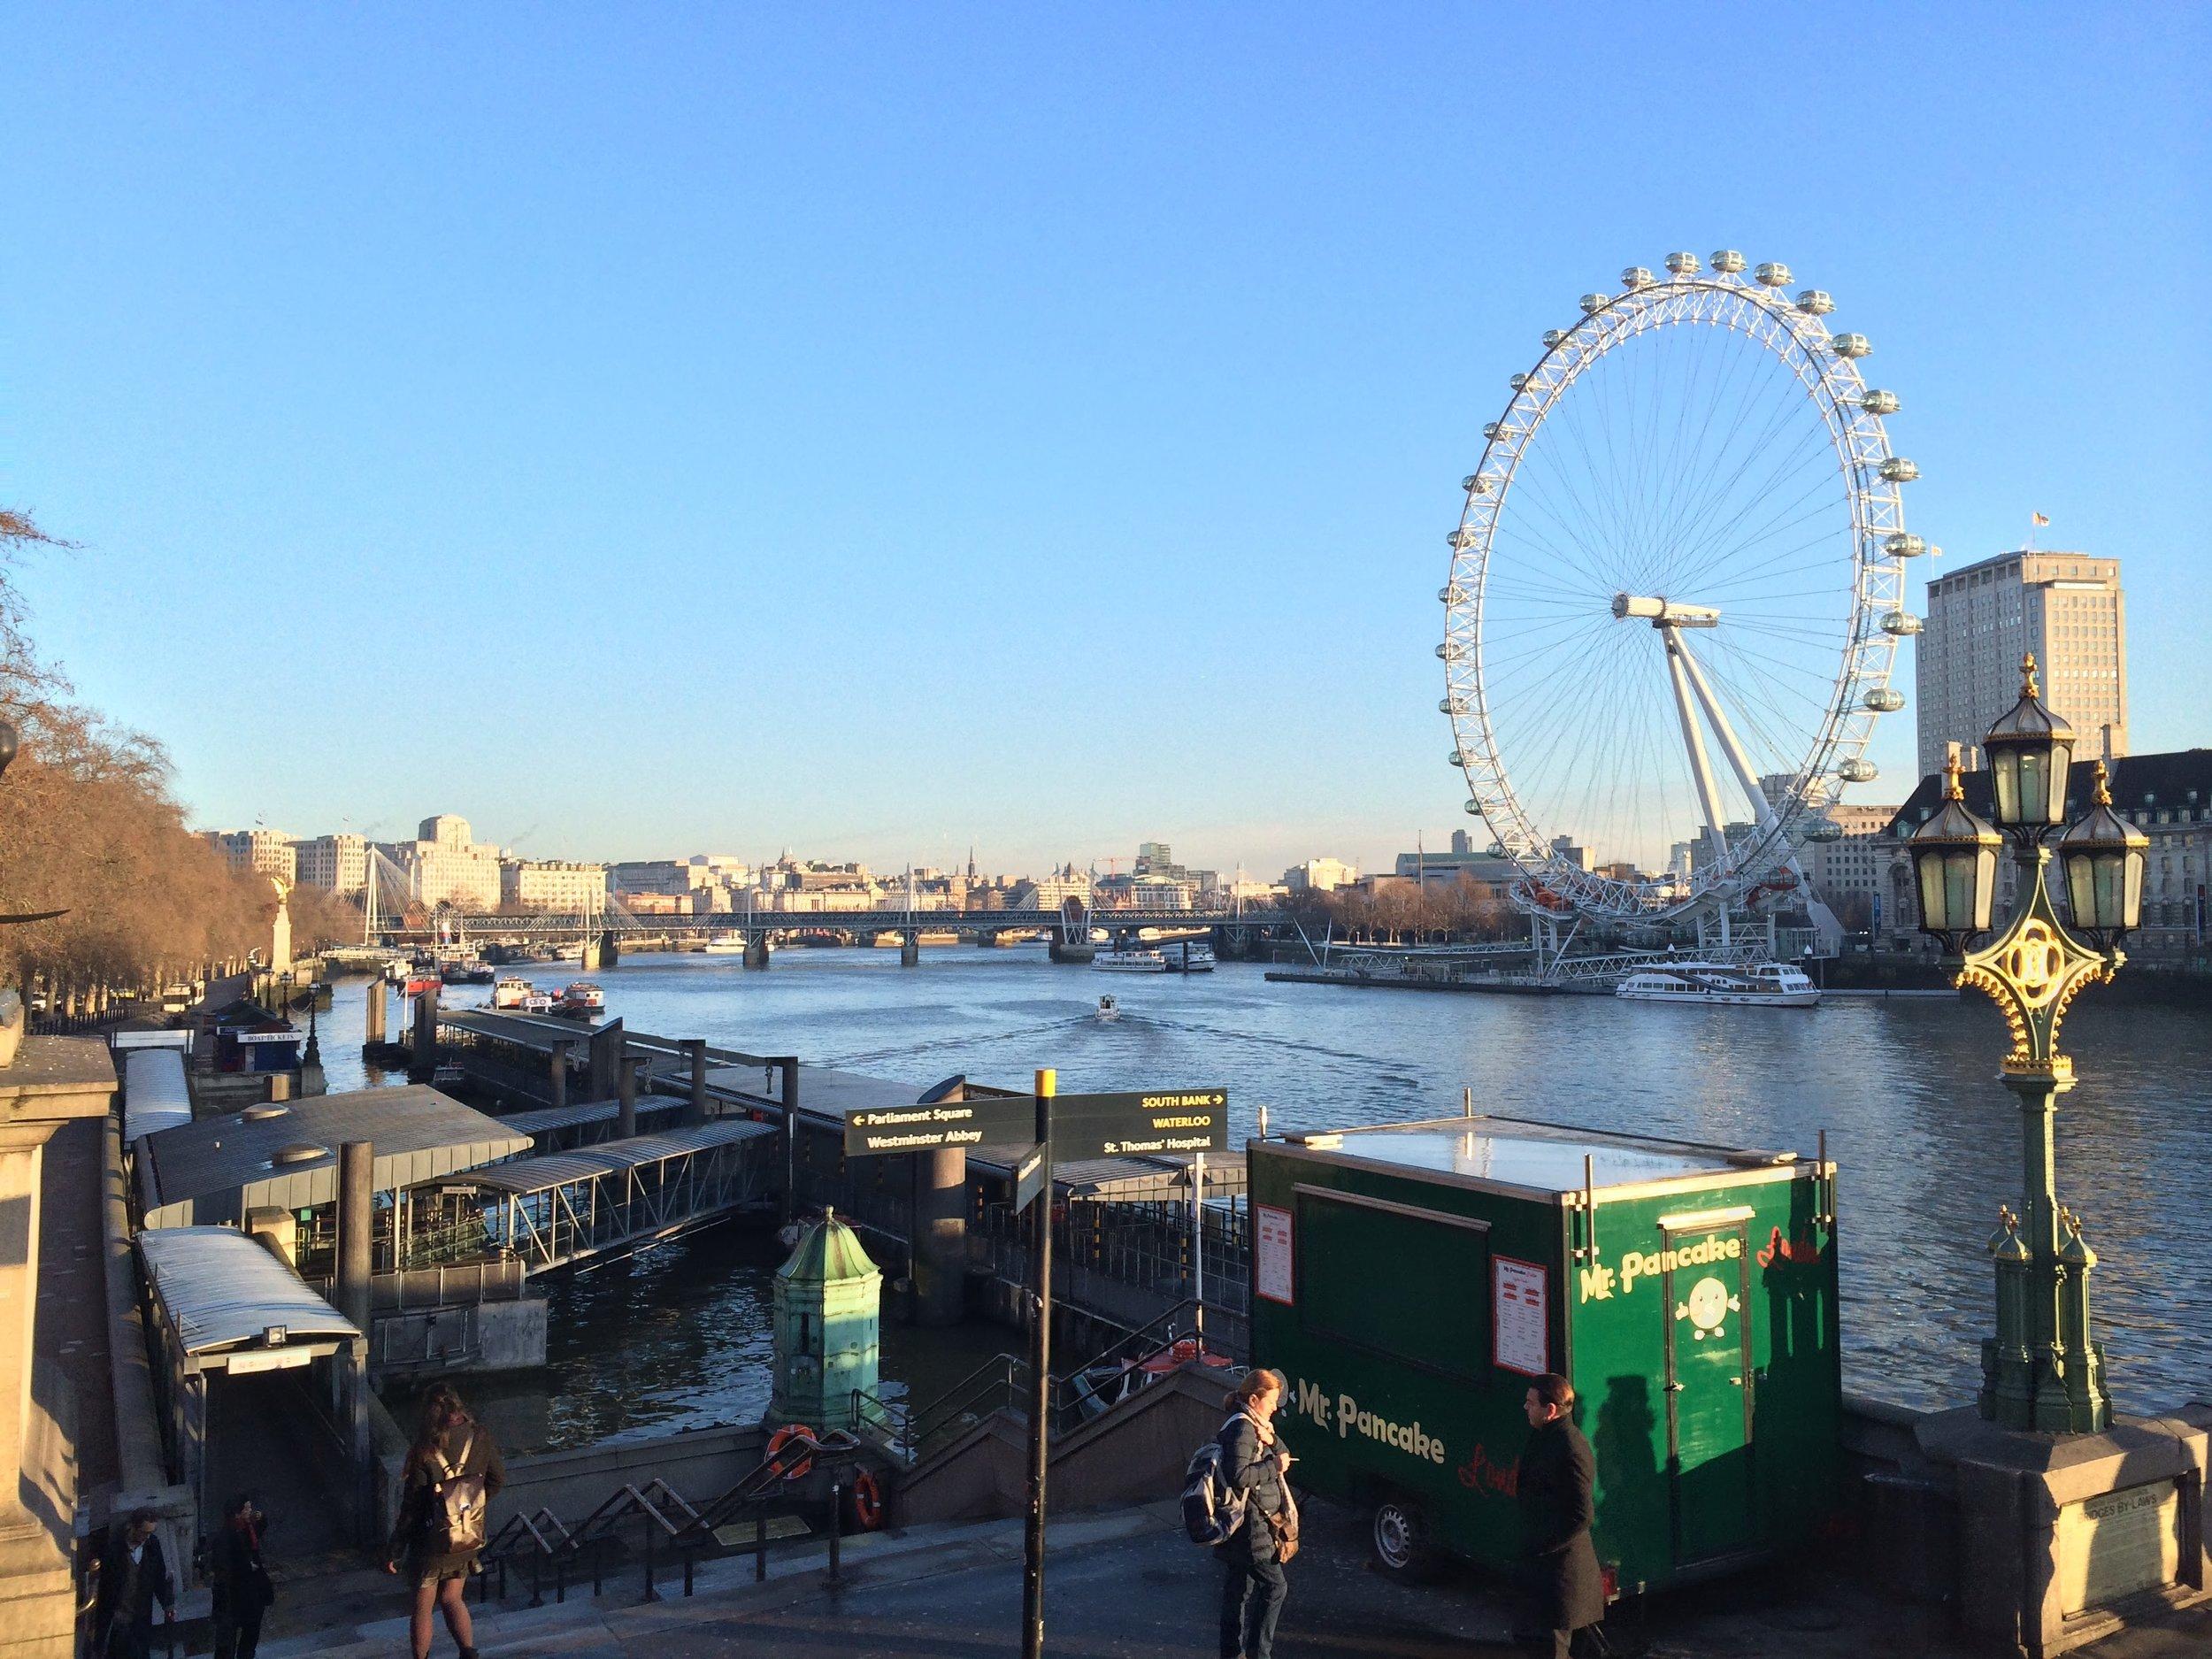 london-river-cruise-tour-private-guide.jpg